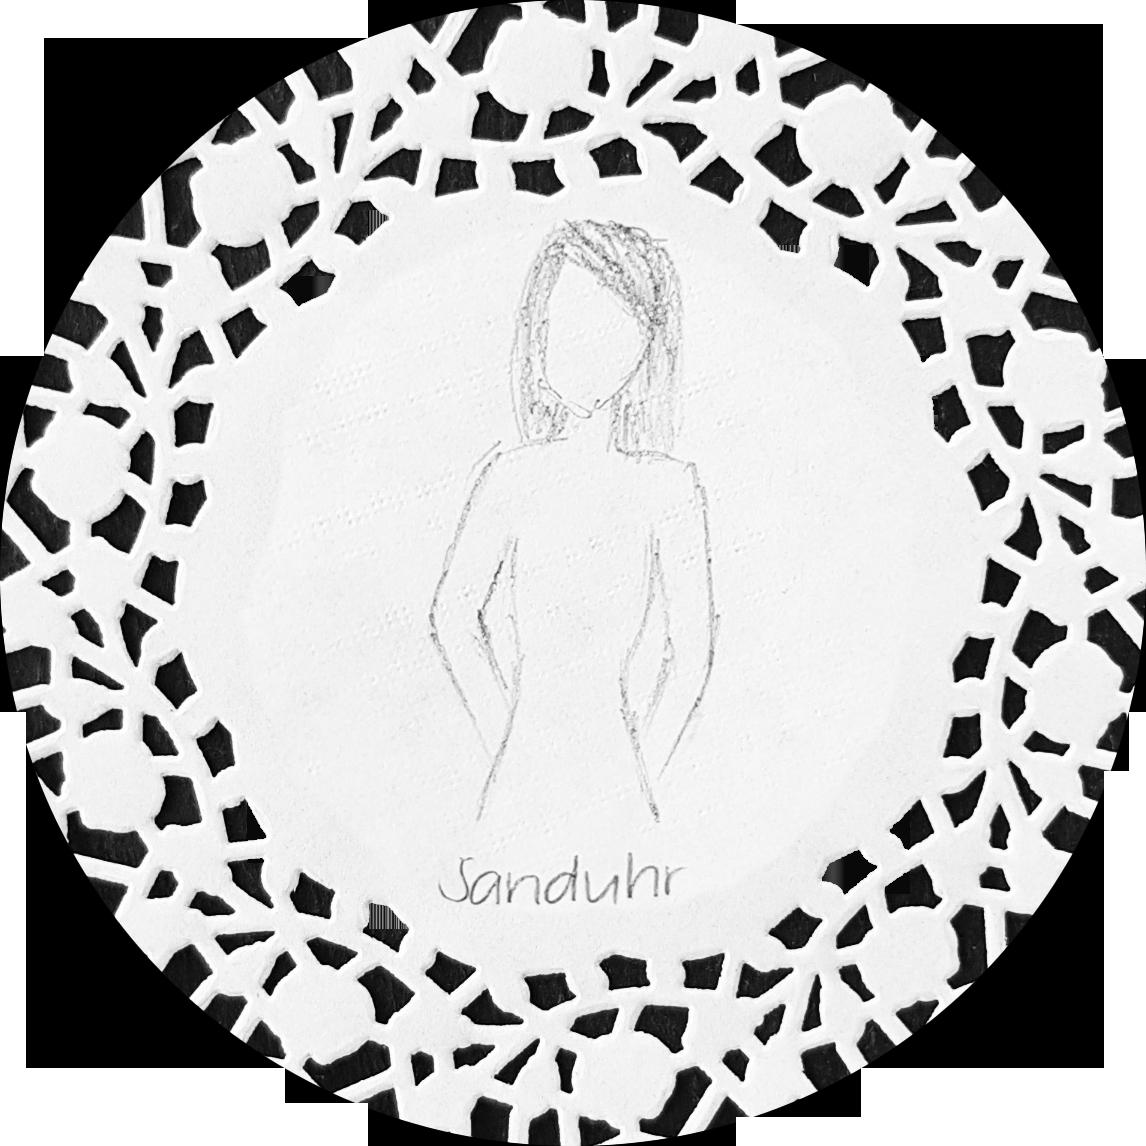 sanduhr_1